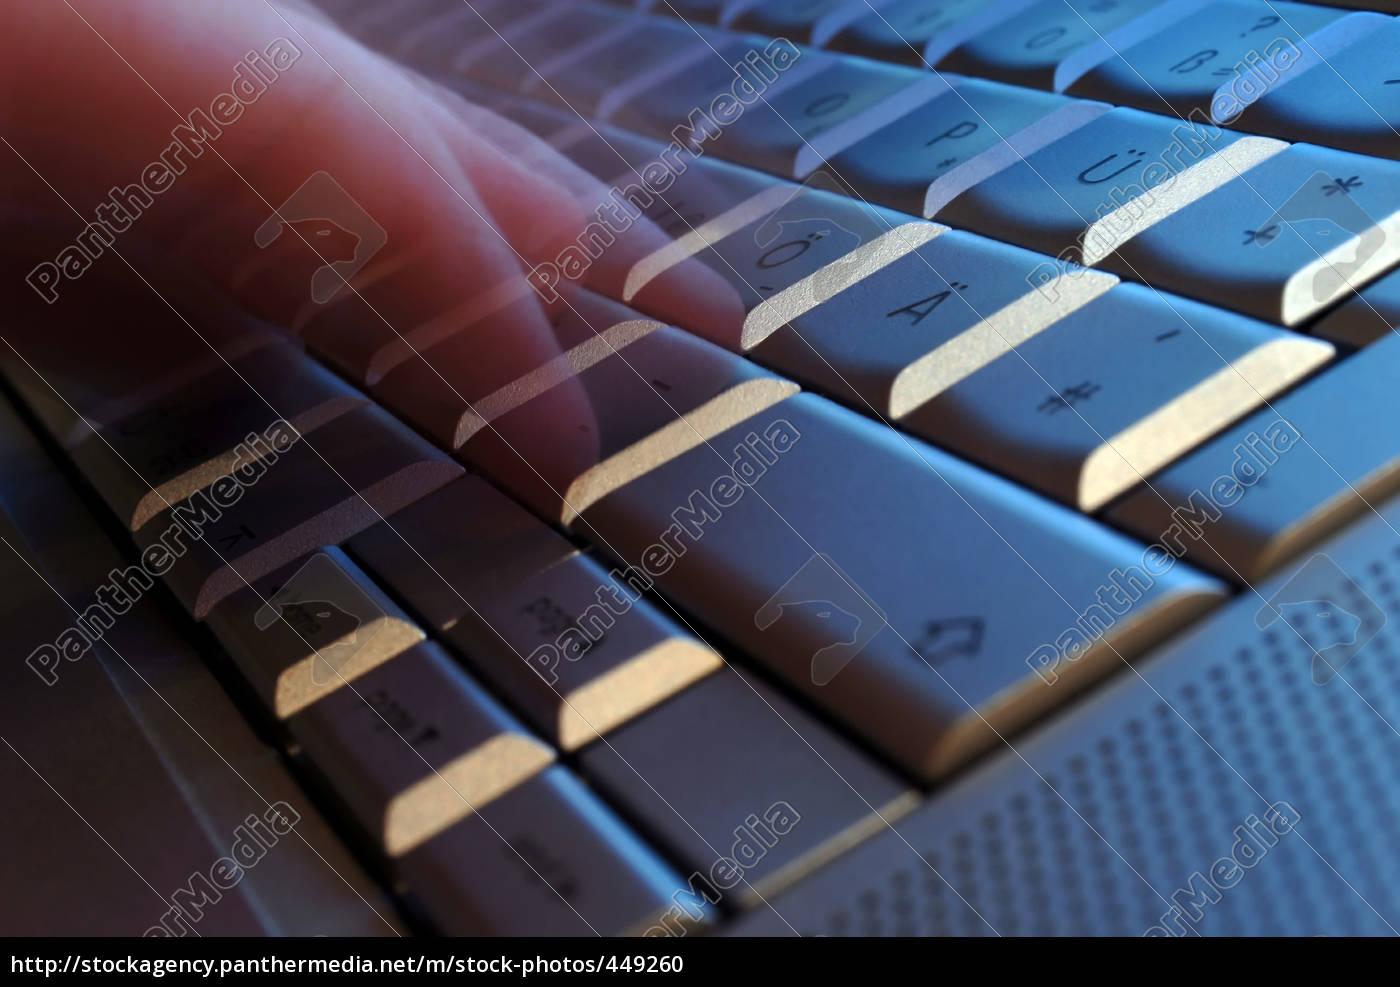 computer, business - 449260